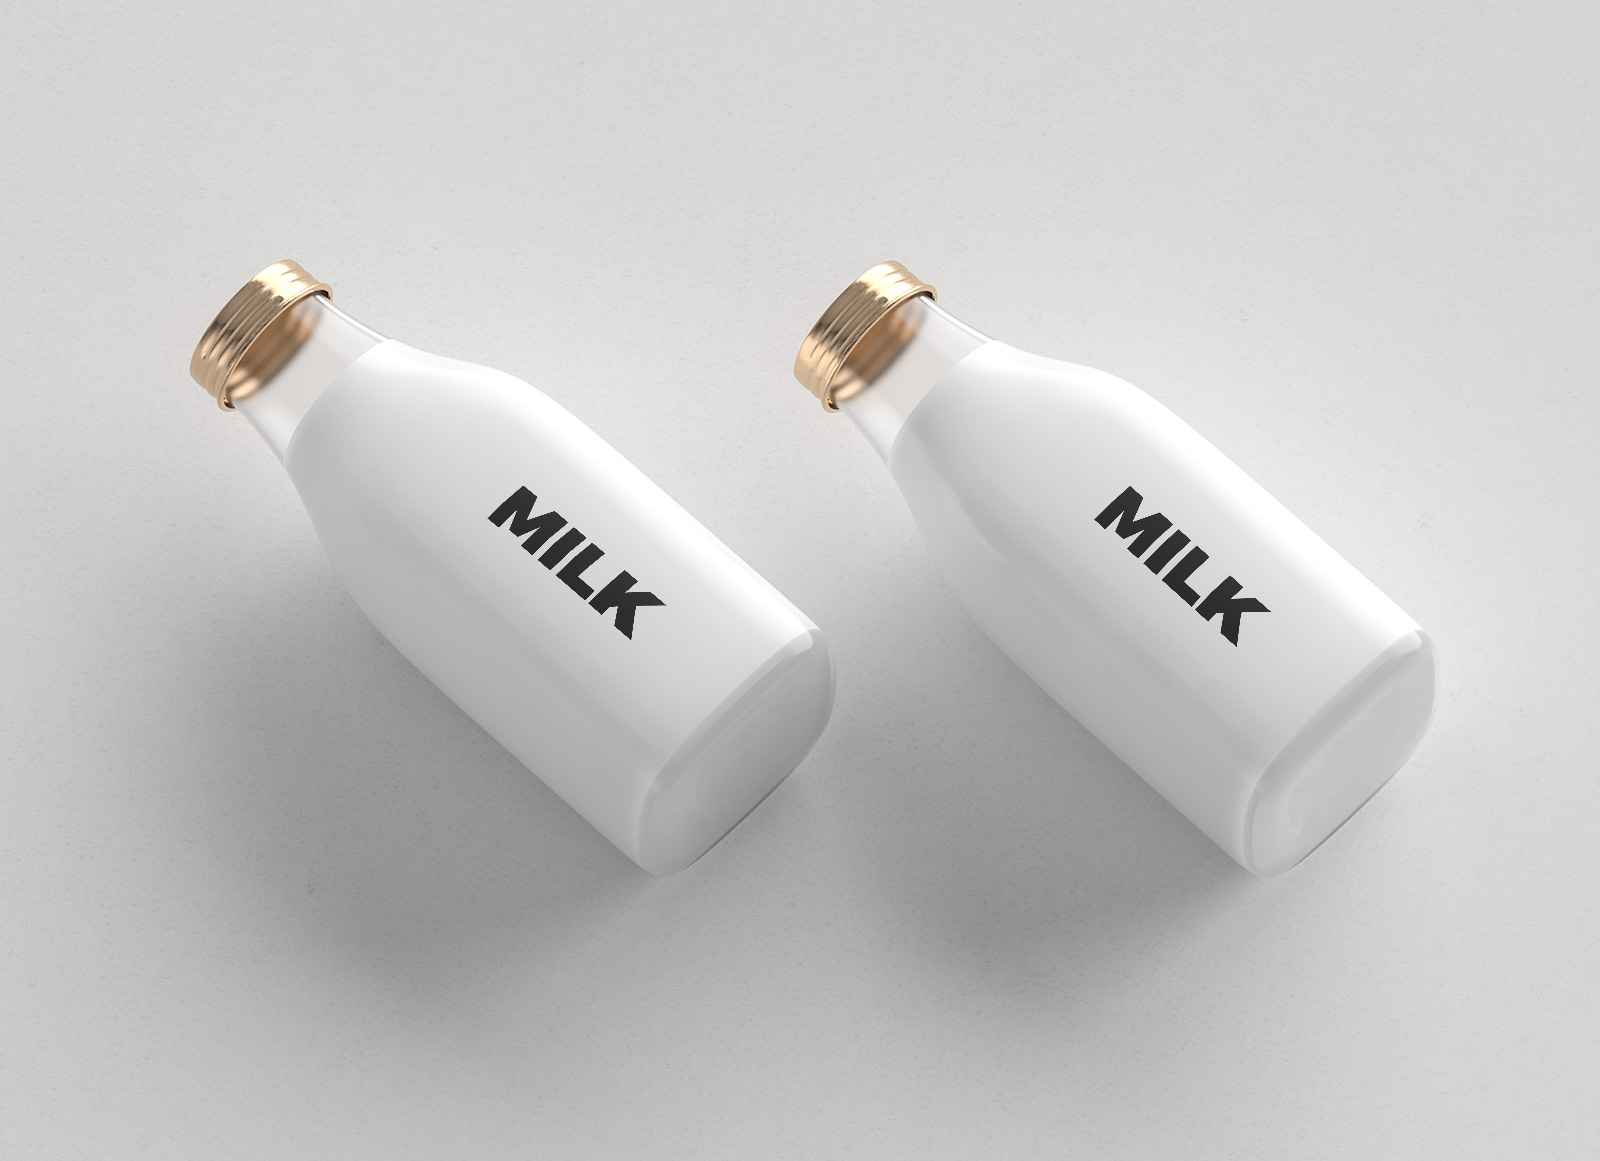 Free-Milk-Glass-Bottle-Mockup-PSD